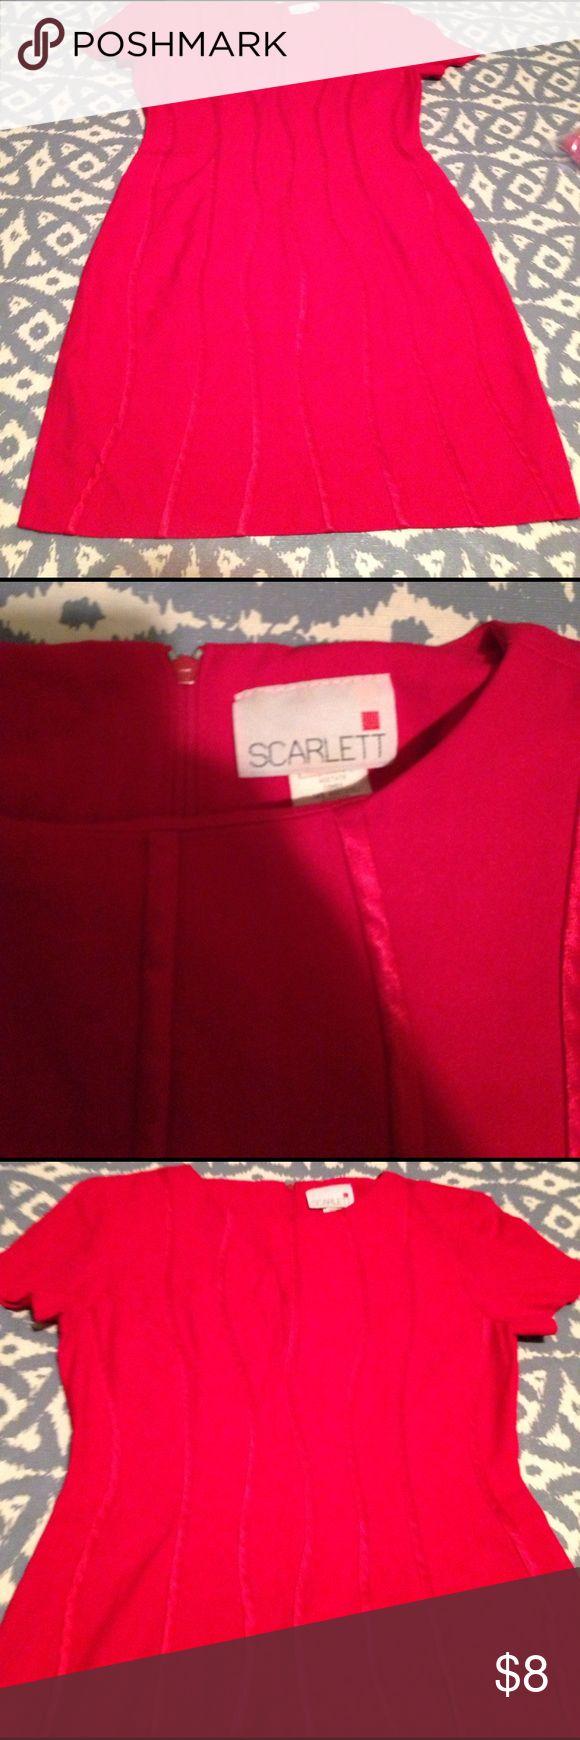 Vintage Scarlett dress modcloth Vintage Scarlett dress  no stain rips size 4 modcloth Scarlett Dresses